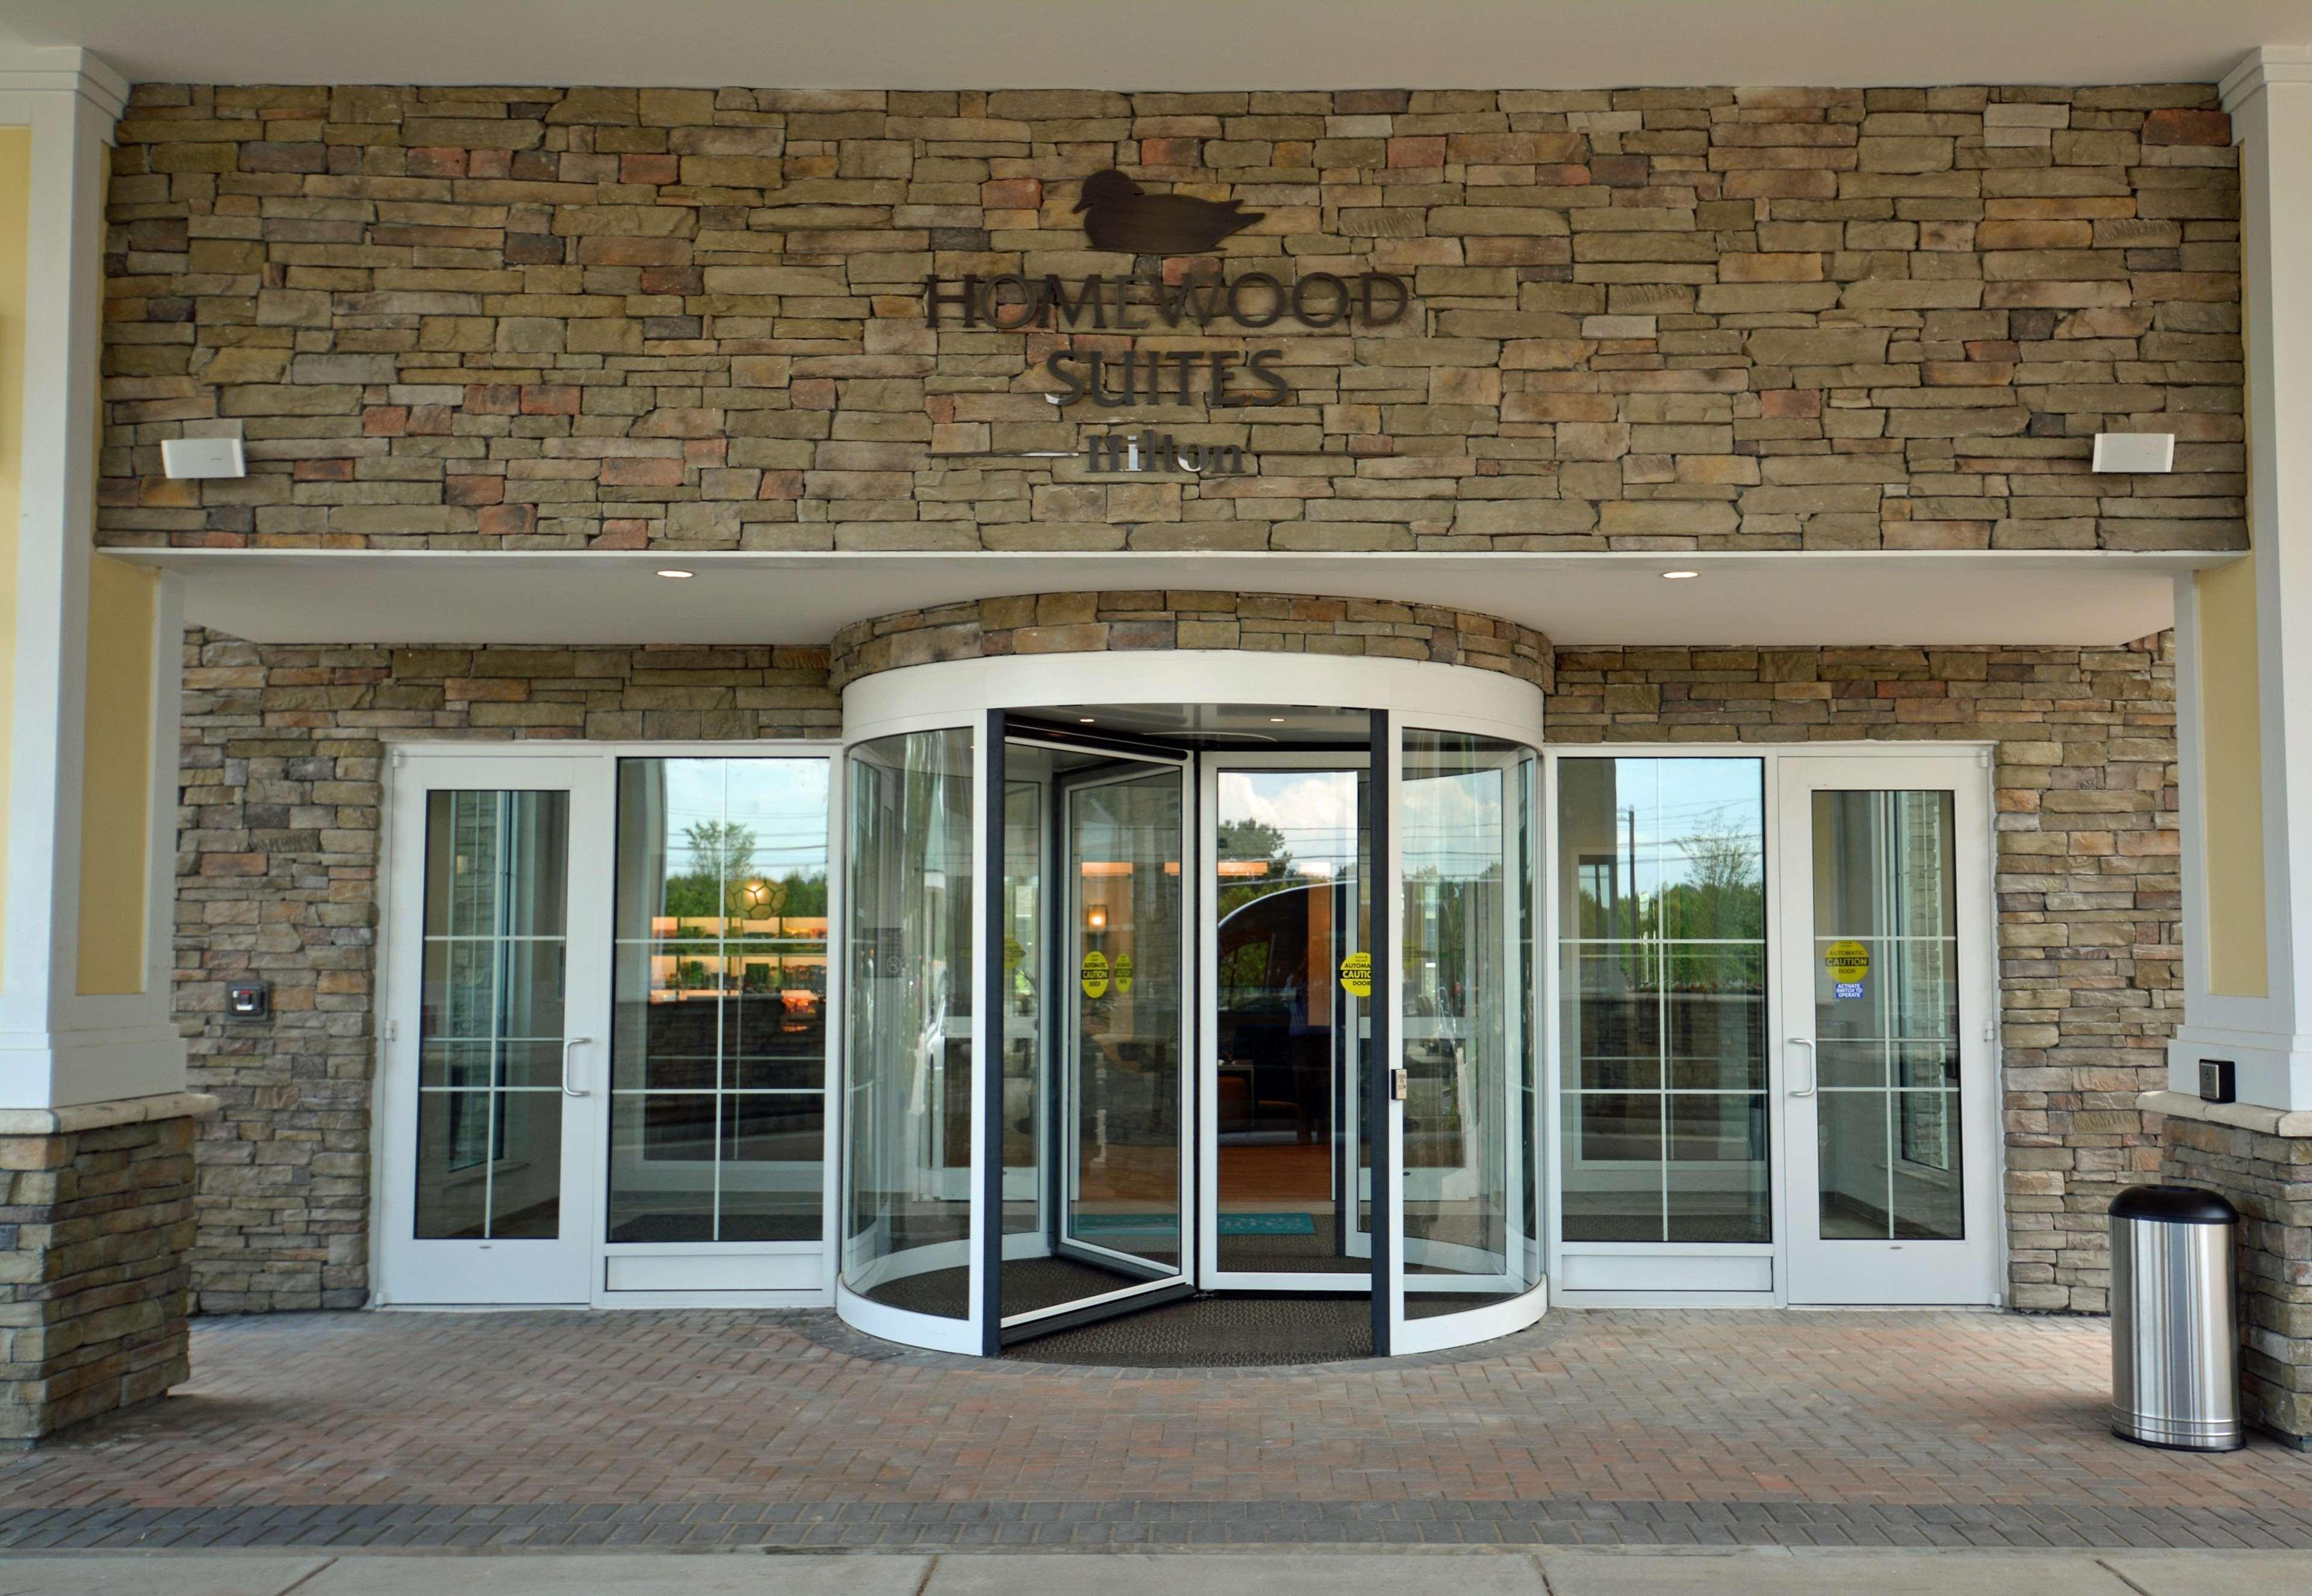 Homewood Suites by Hilton Saratoga Springs image 13